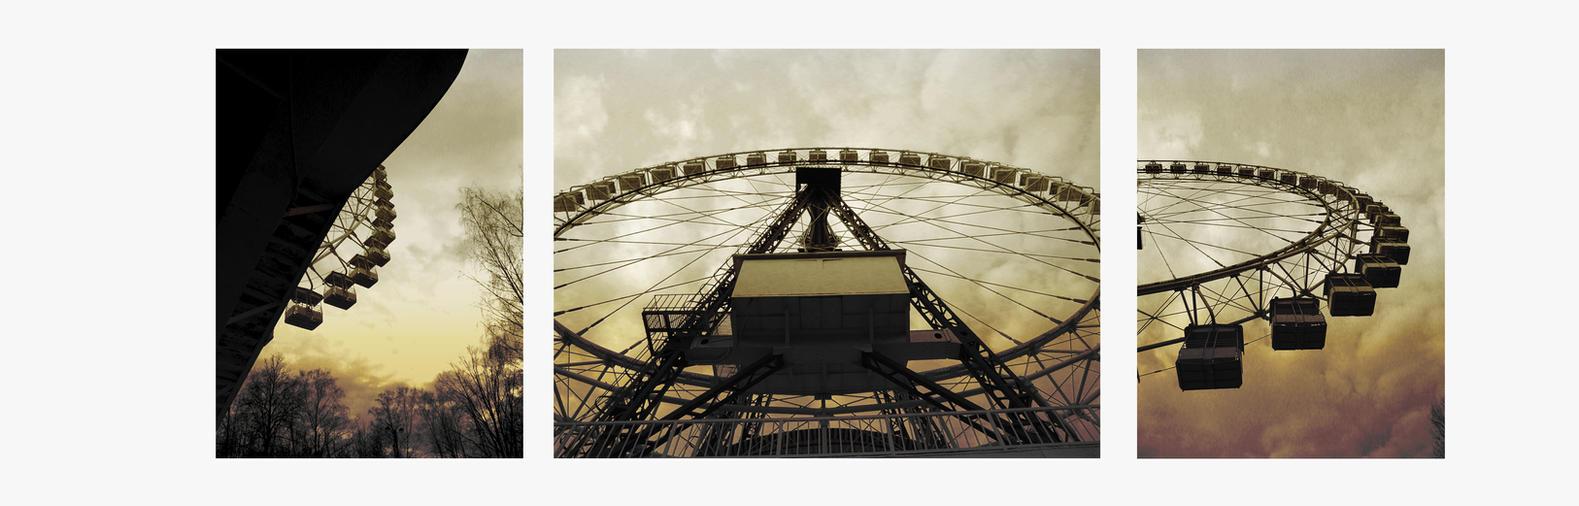 Ferris wheel by BForce